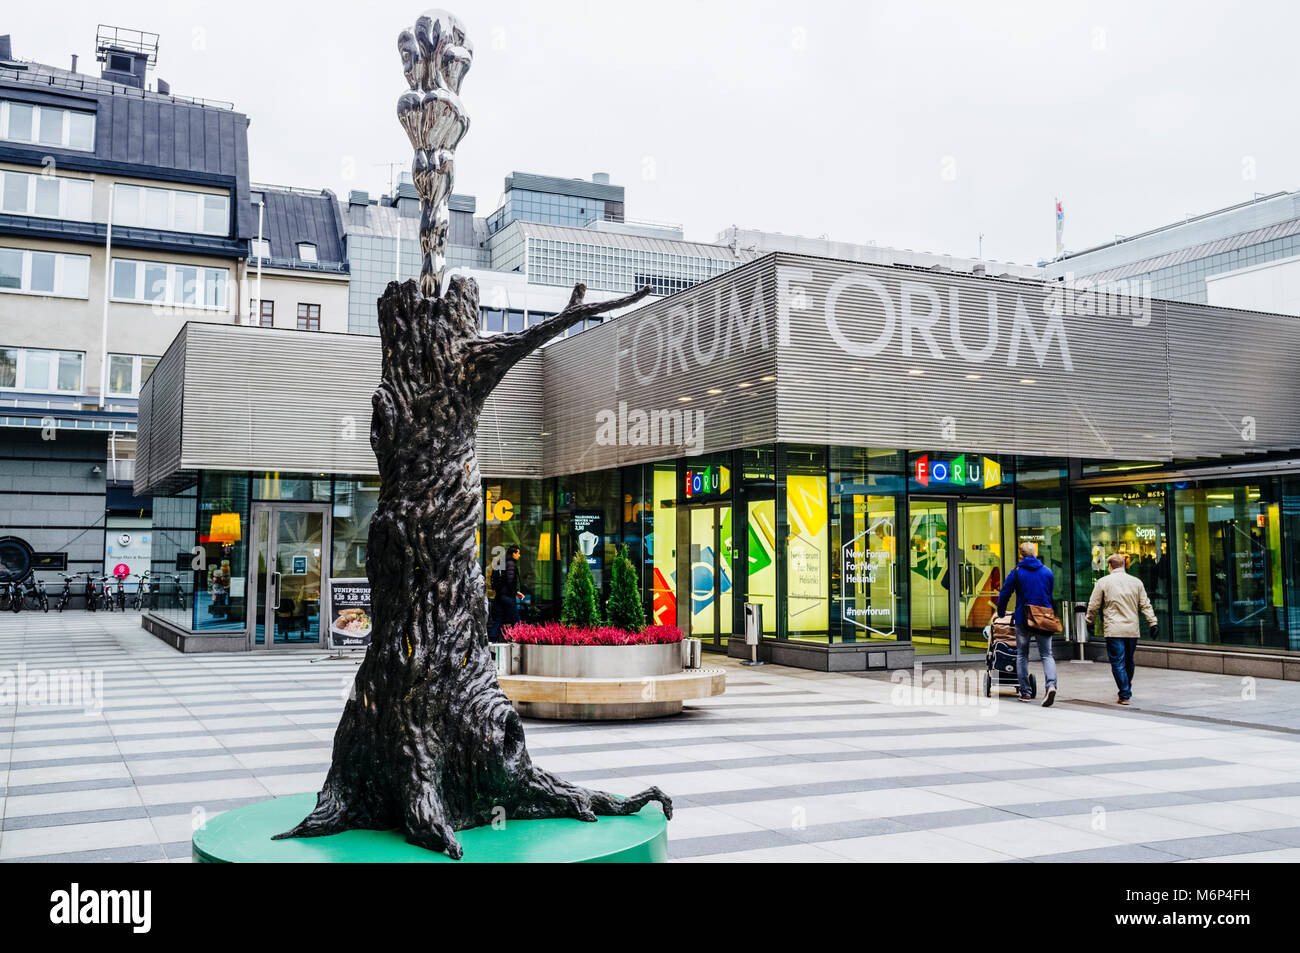 Forum department store, Helsinki, Finland - Stock Image